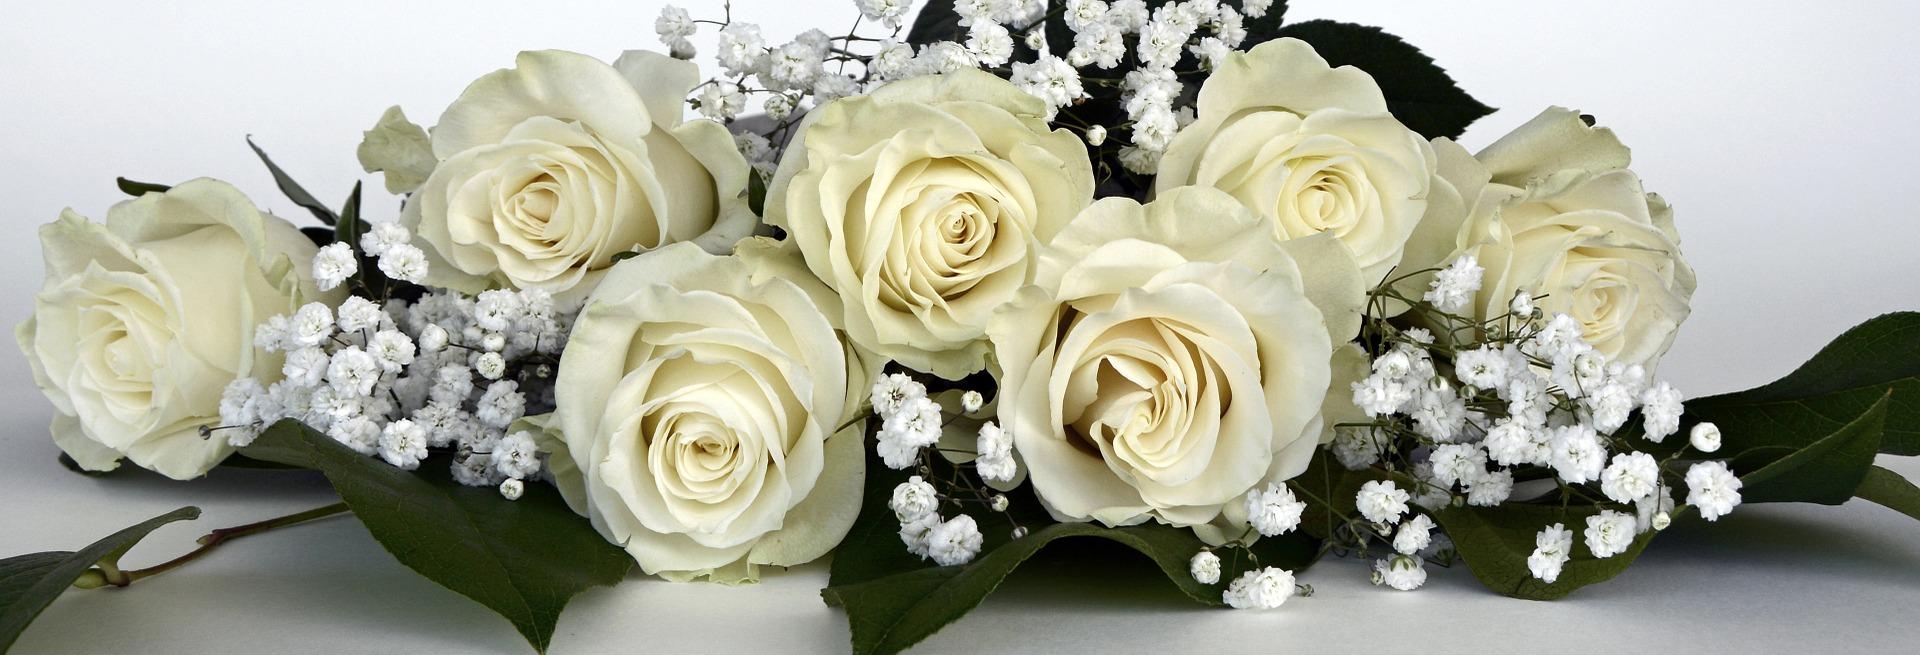 roses-1420725_1920